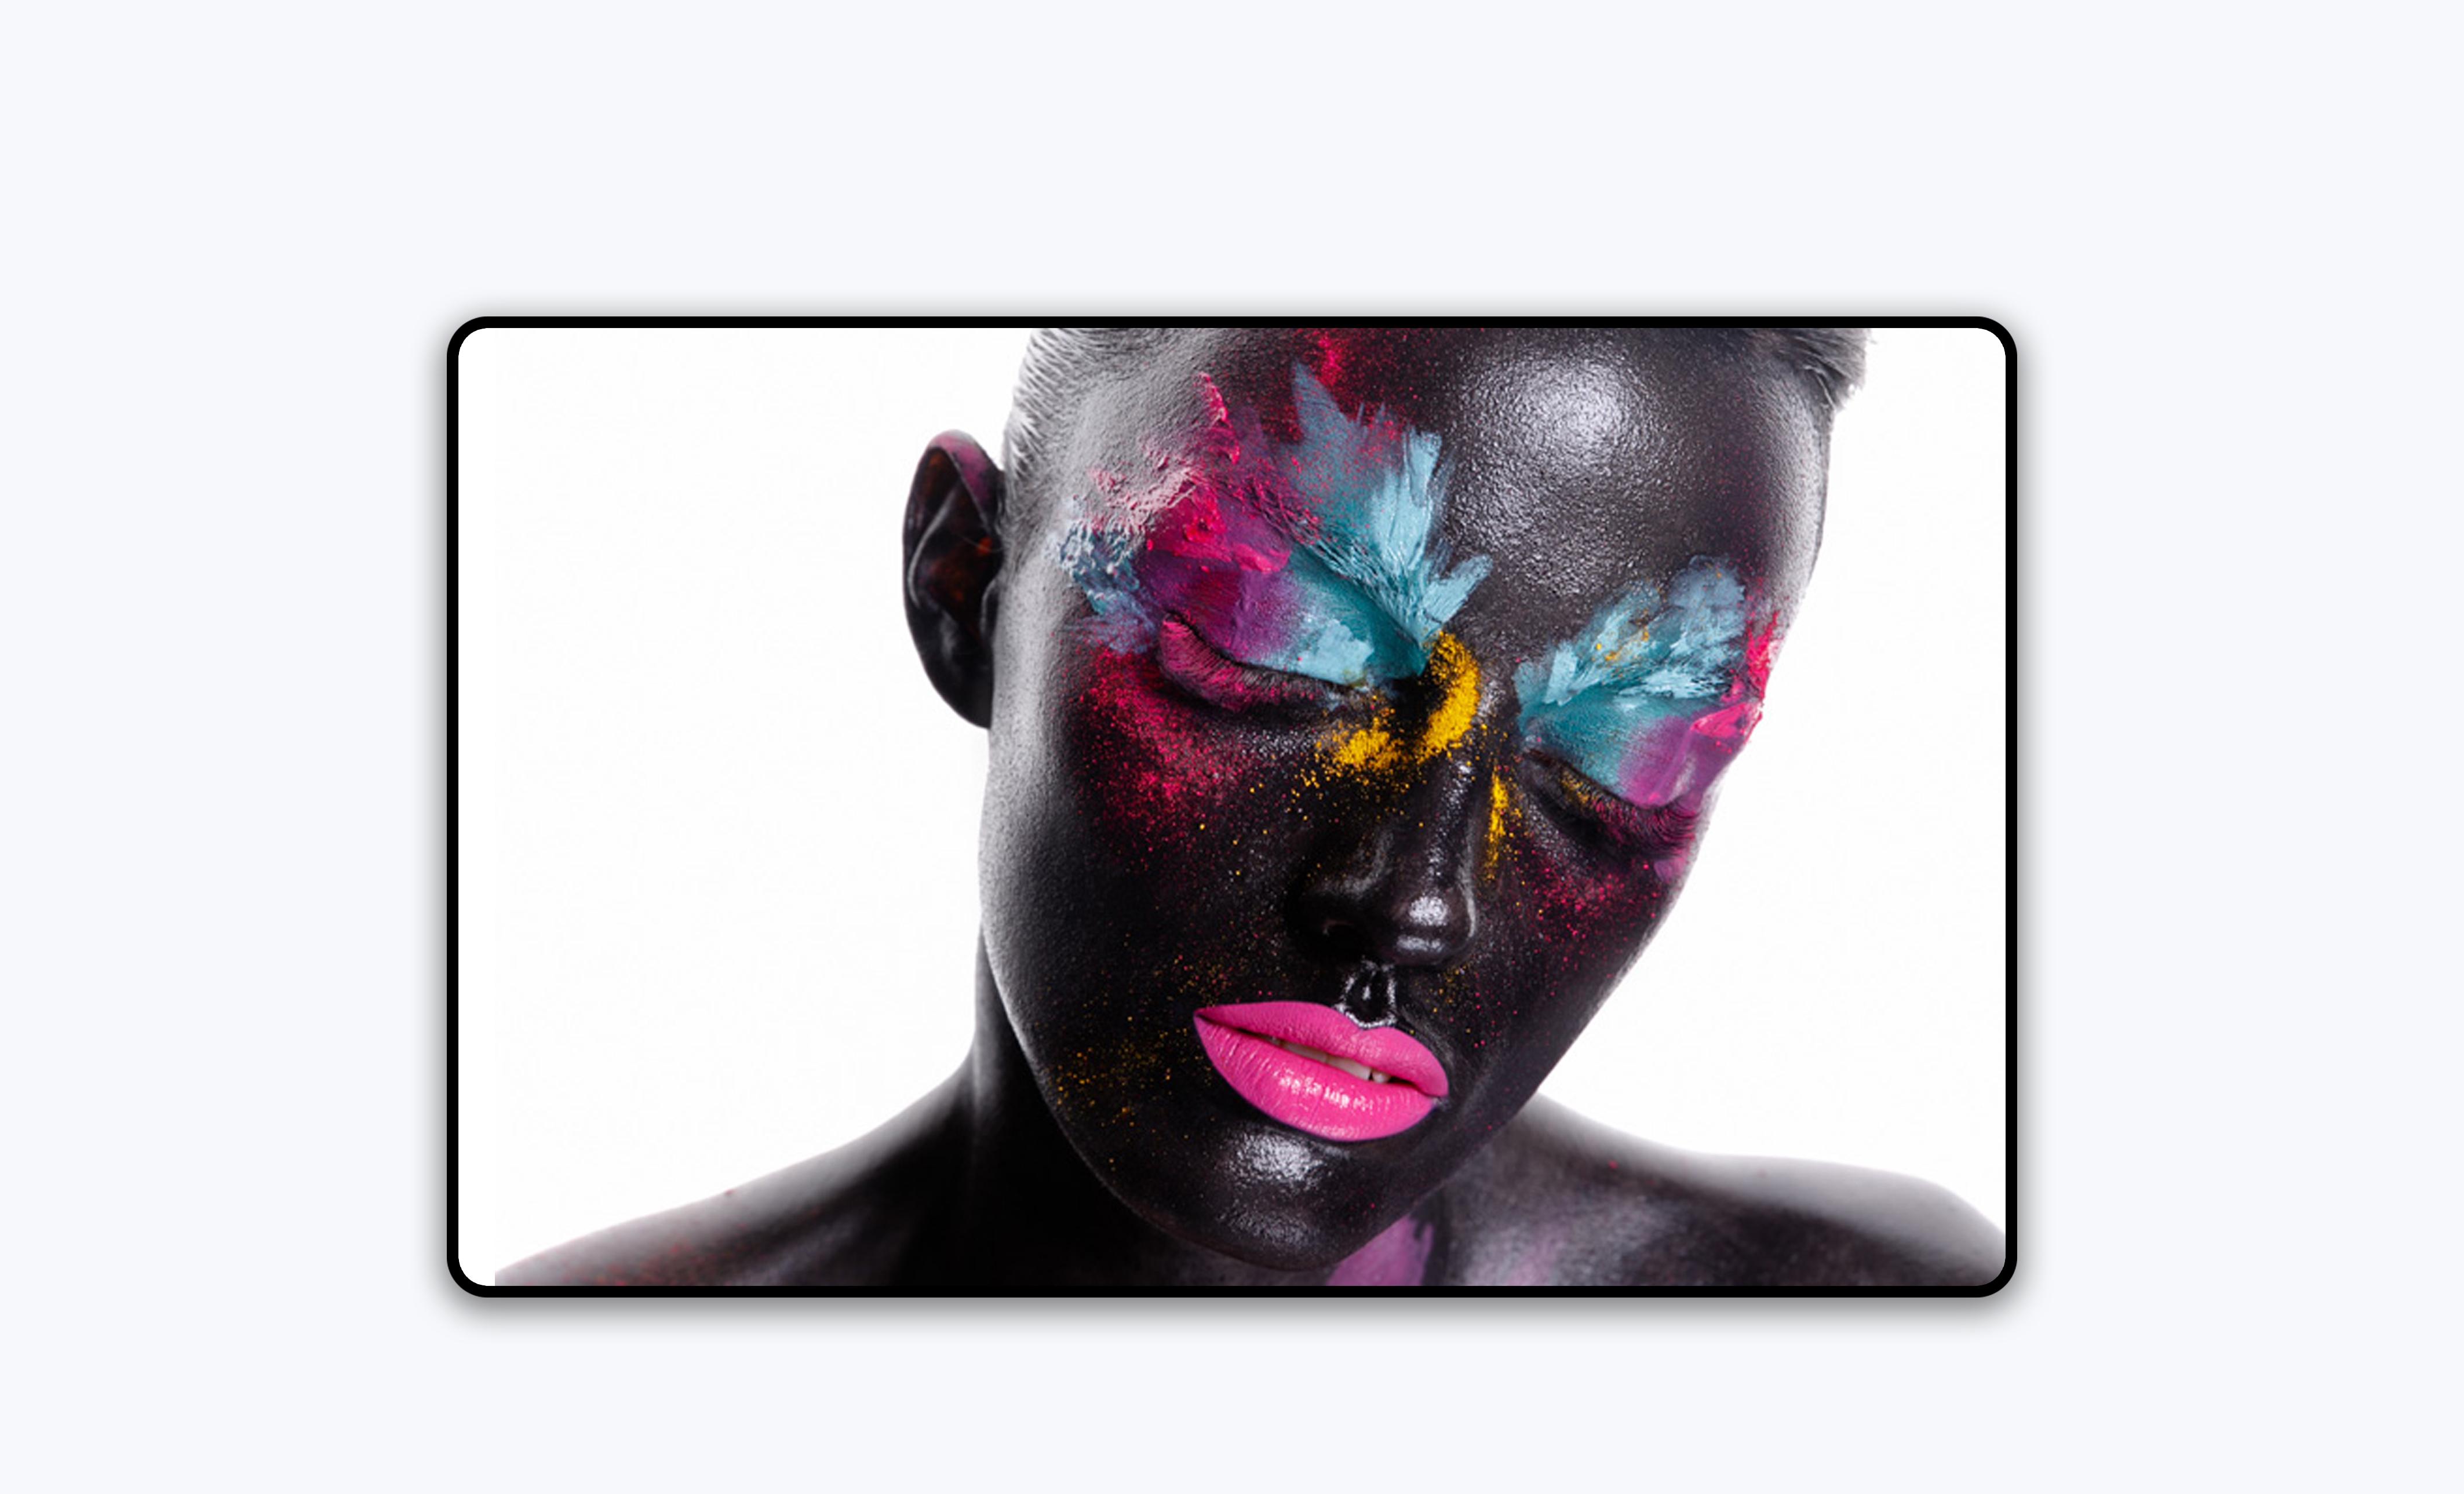 The Art Face